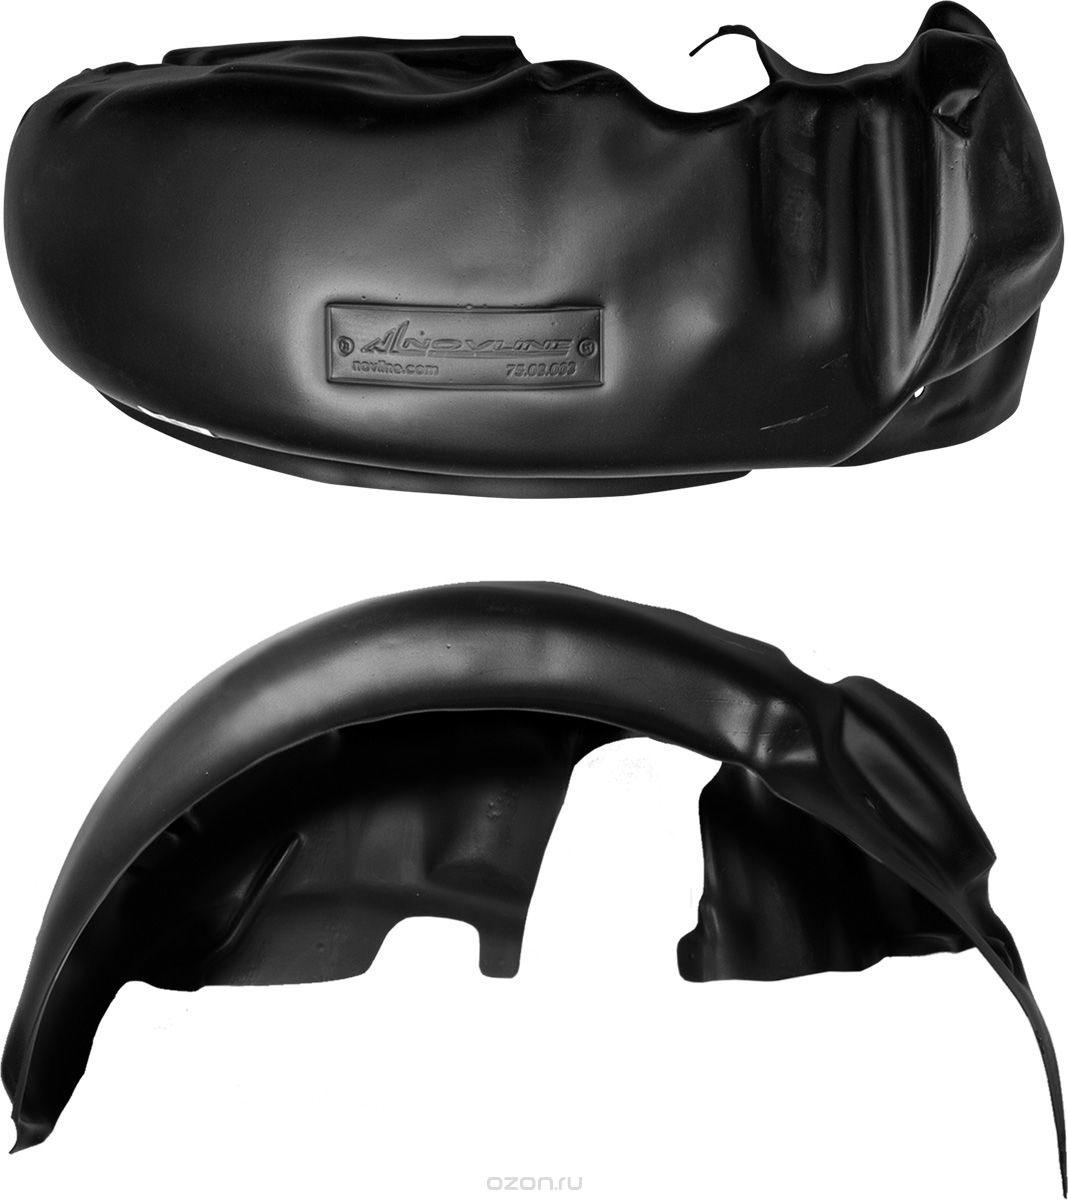 Подкрылок Novline-Autofamily, для Faw Besturn B50, 2012->, передний правый подкрылок novline autofamily для faw besturn b50 2012 задний правый